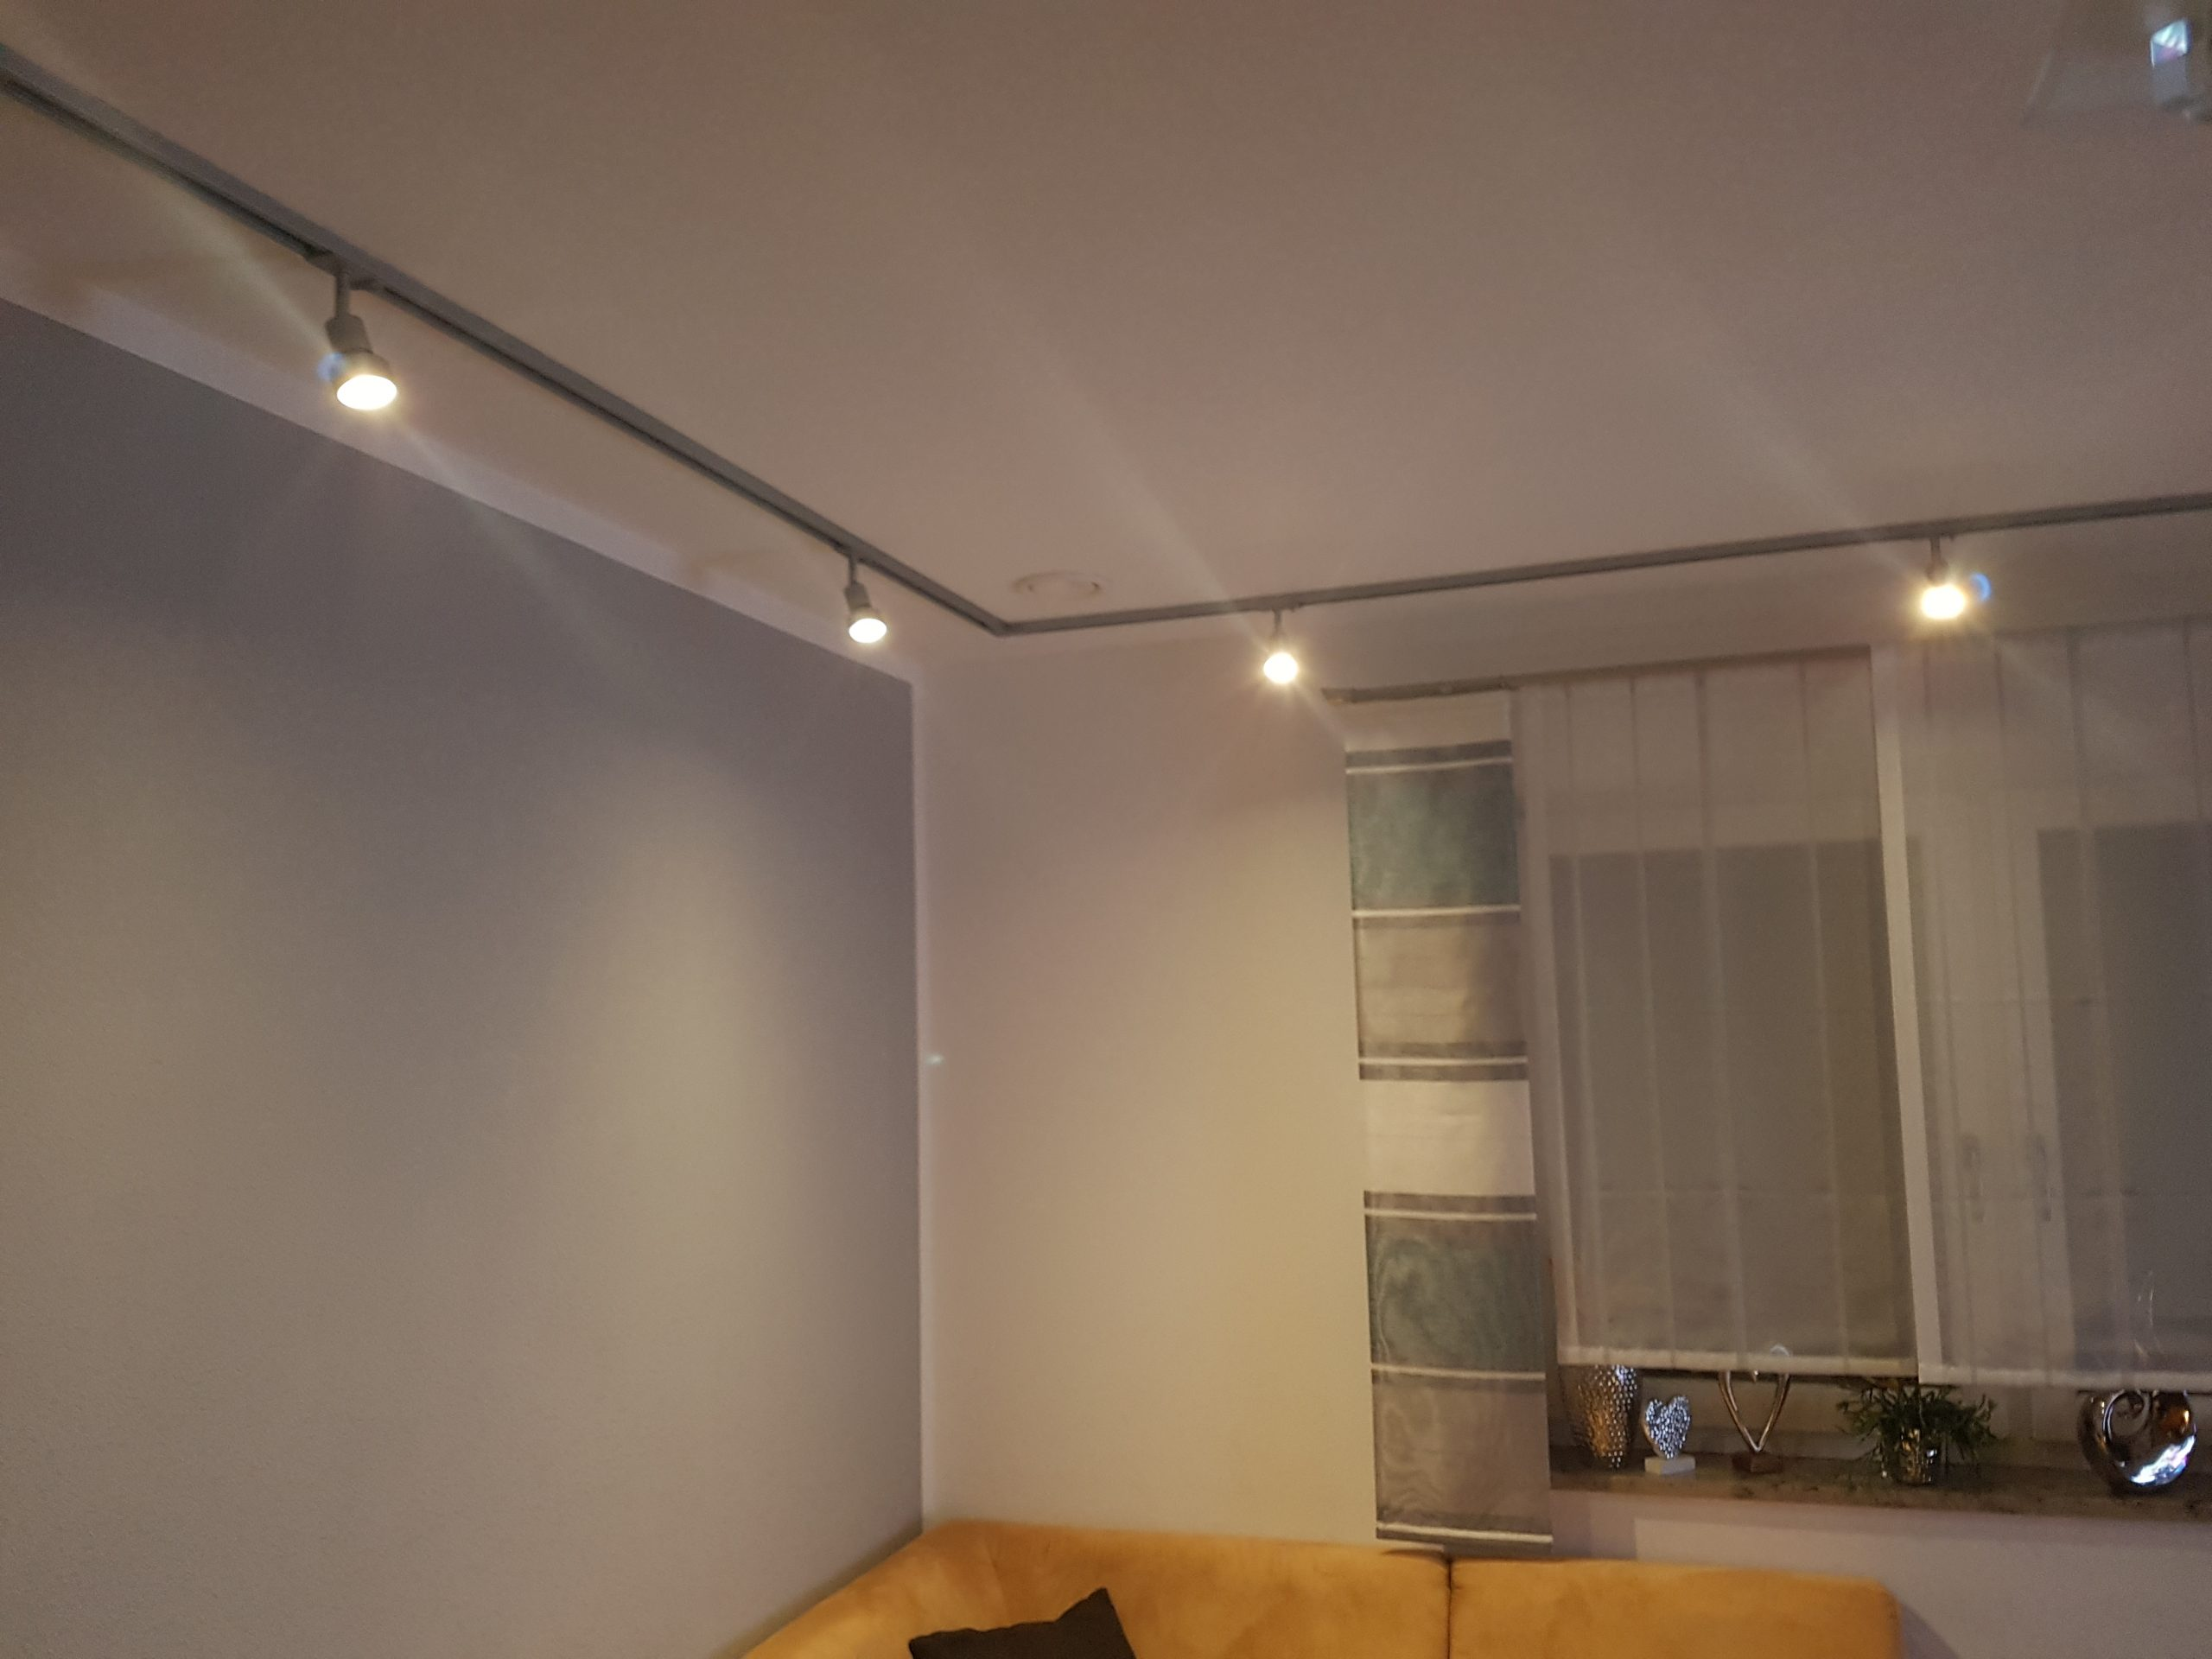 Full Size of Wohnzimmer Indirekte Beleuchtung Ideen Decke Mit Indirekter Selber Machen Spots Wohnwand Led Modern Anleitung Bauen Niedrige Wand Wie Sie Ihr Ideal Beleuchten Wohnzimmer Wohnzimmer Beleuchtung